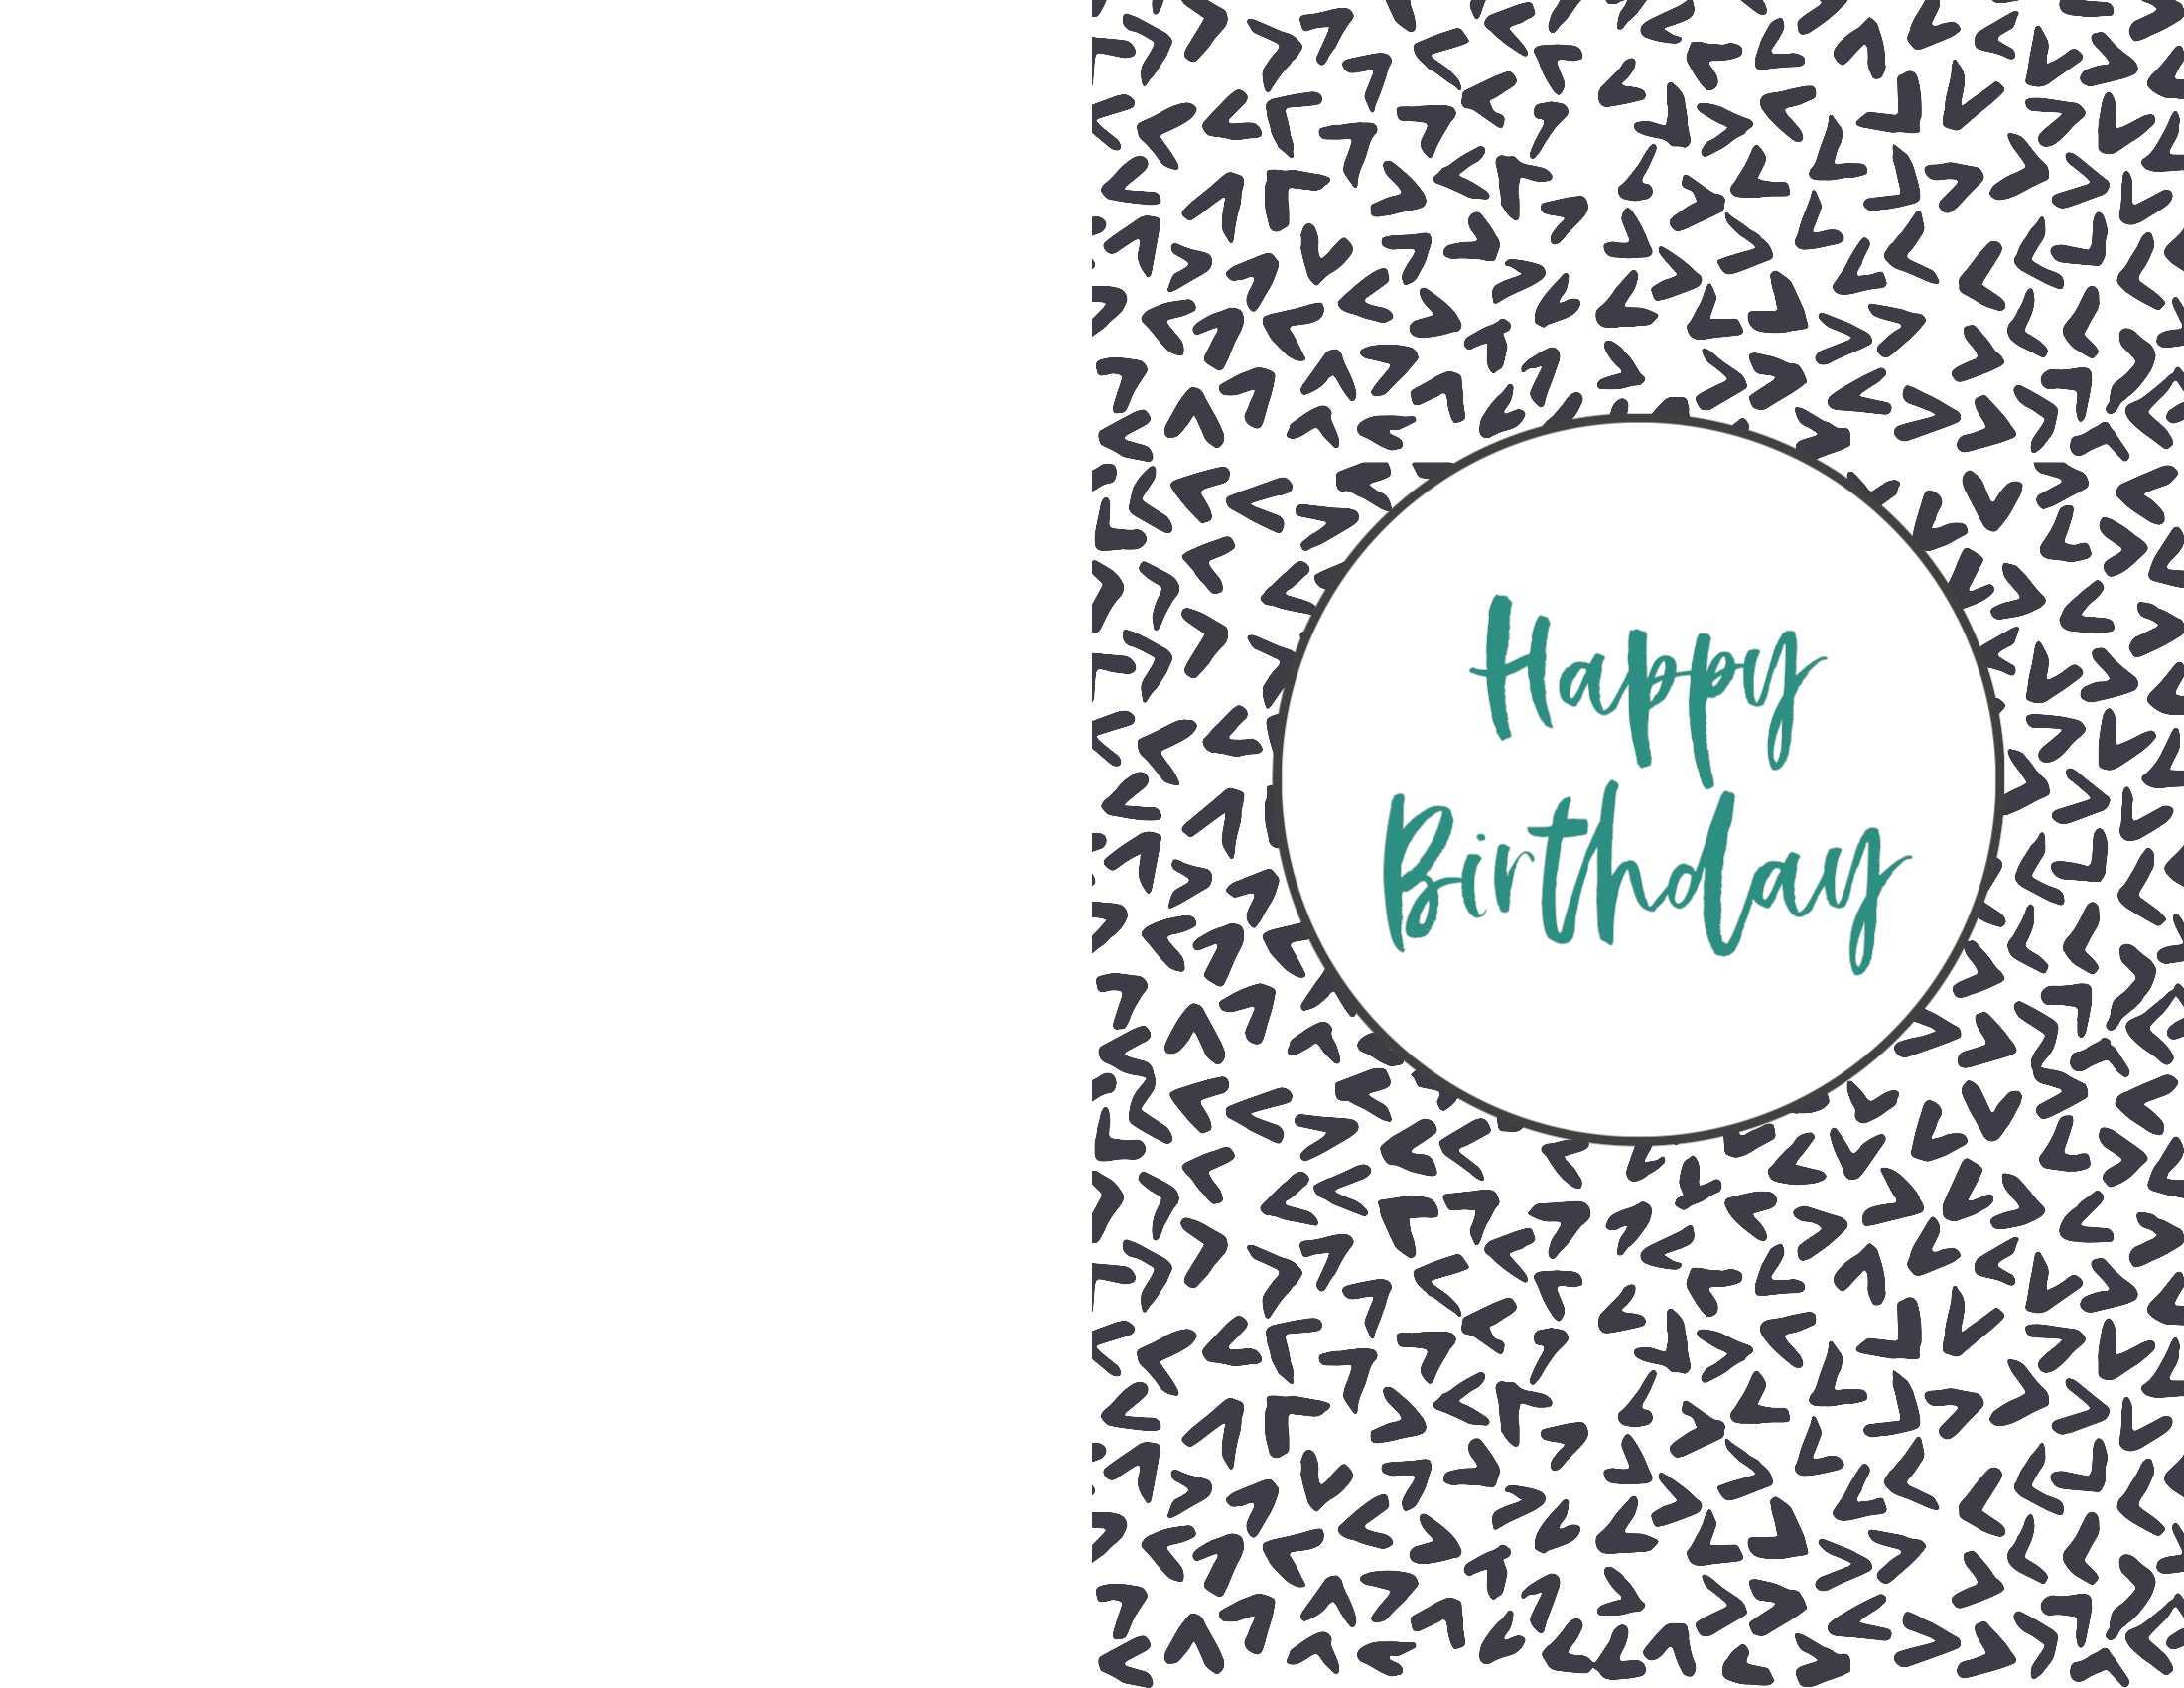 Birthday Card Print Out - Dalep.midnightpig.co Regarding Foldable Birthday Card Template